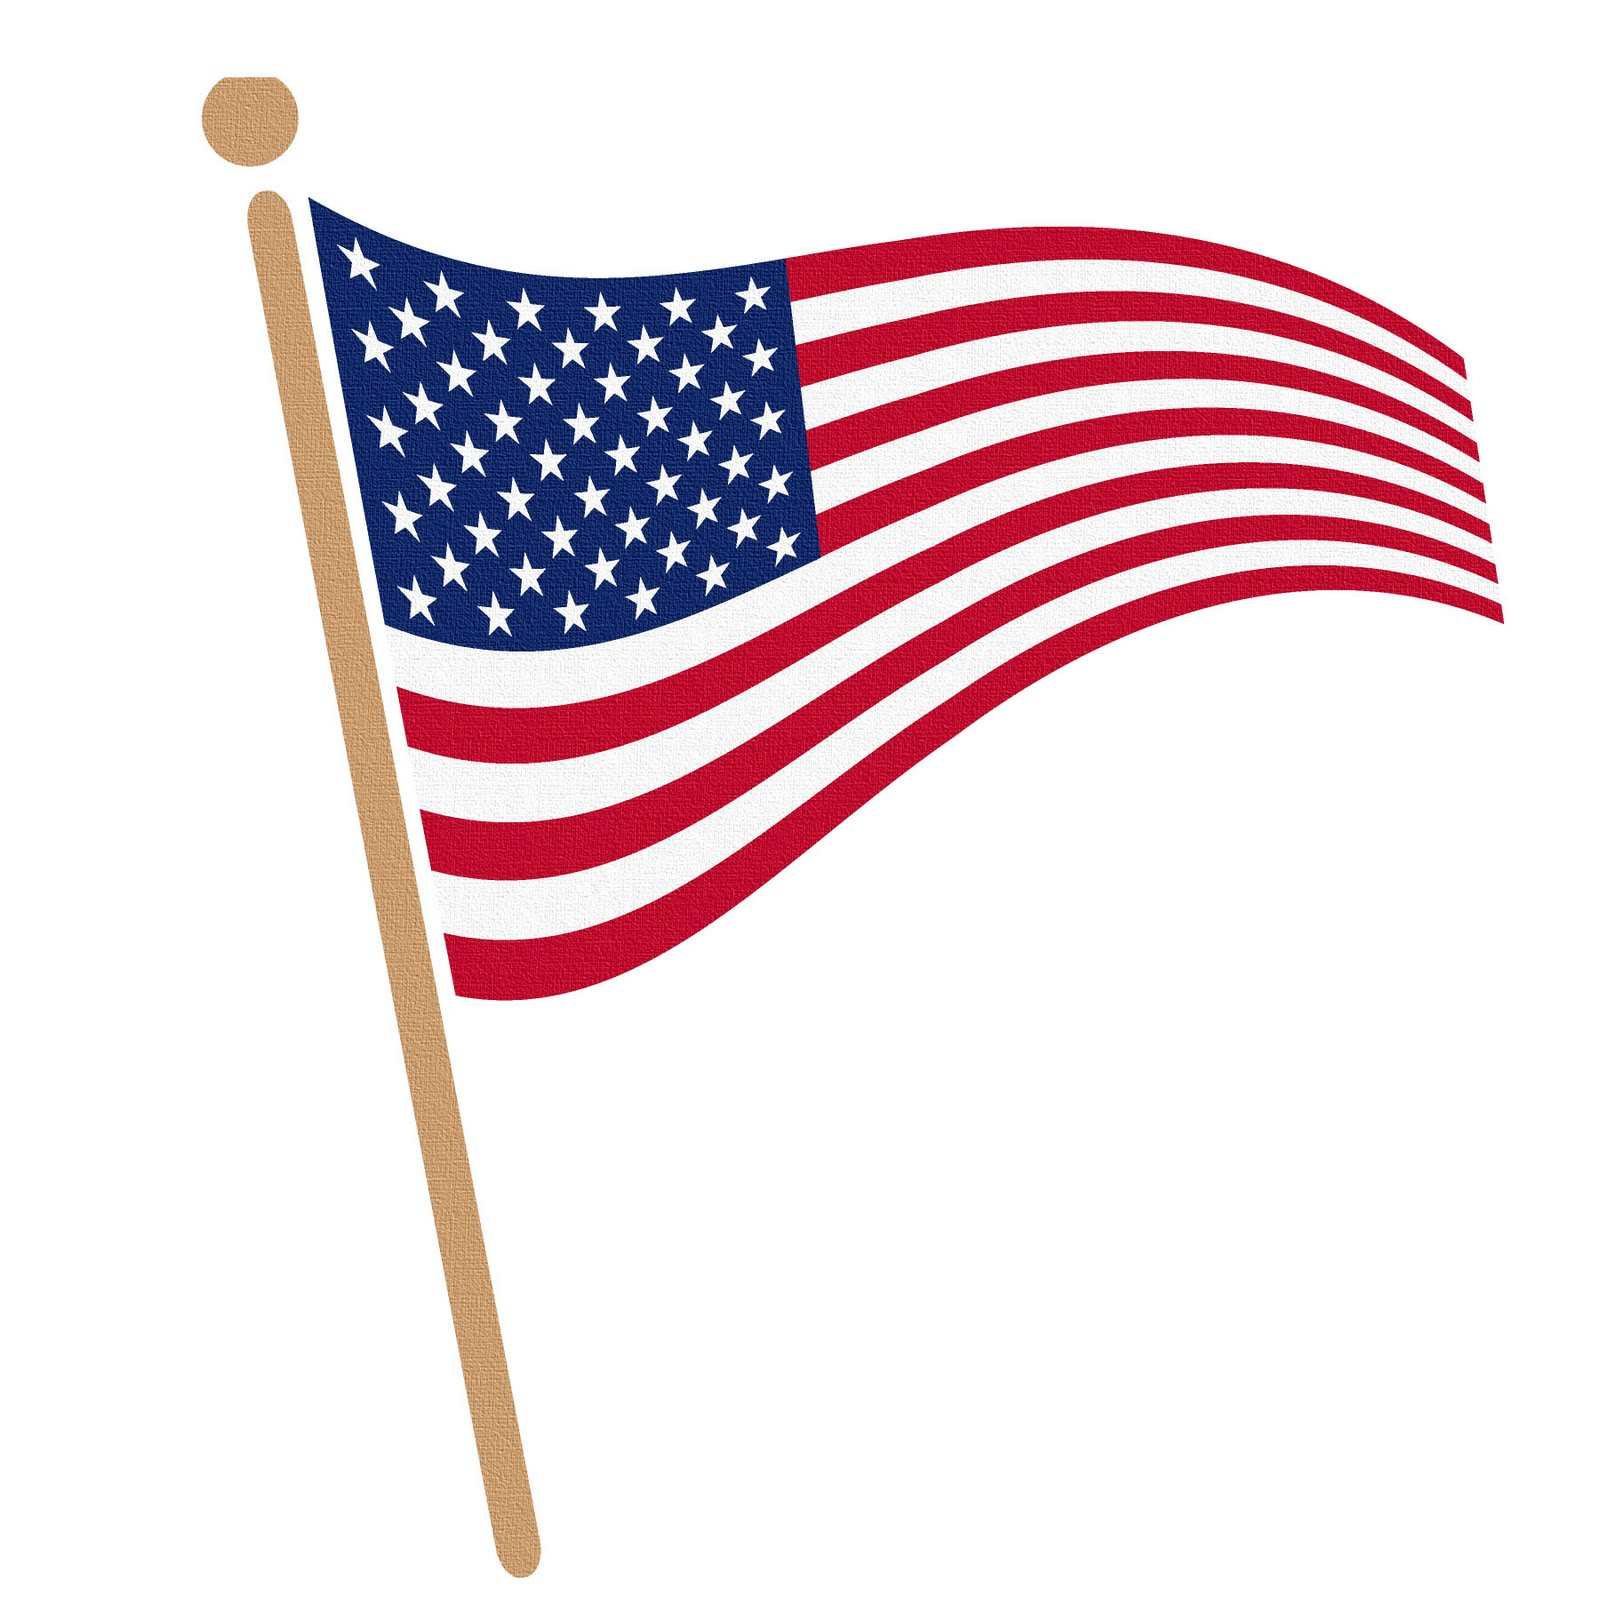 1600x1600 Waving American Flag Clip Art Clipart Bay